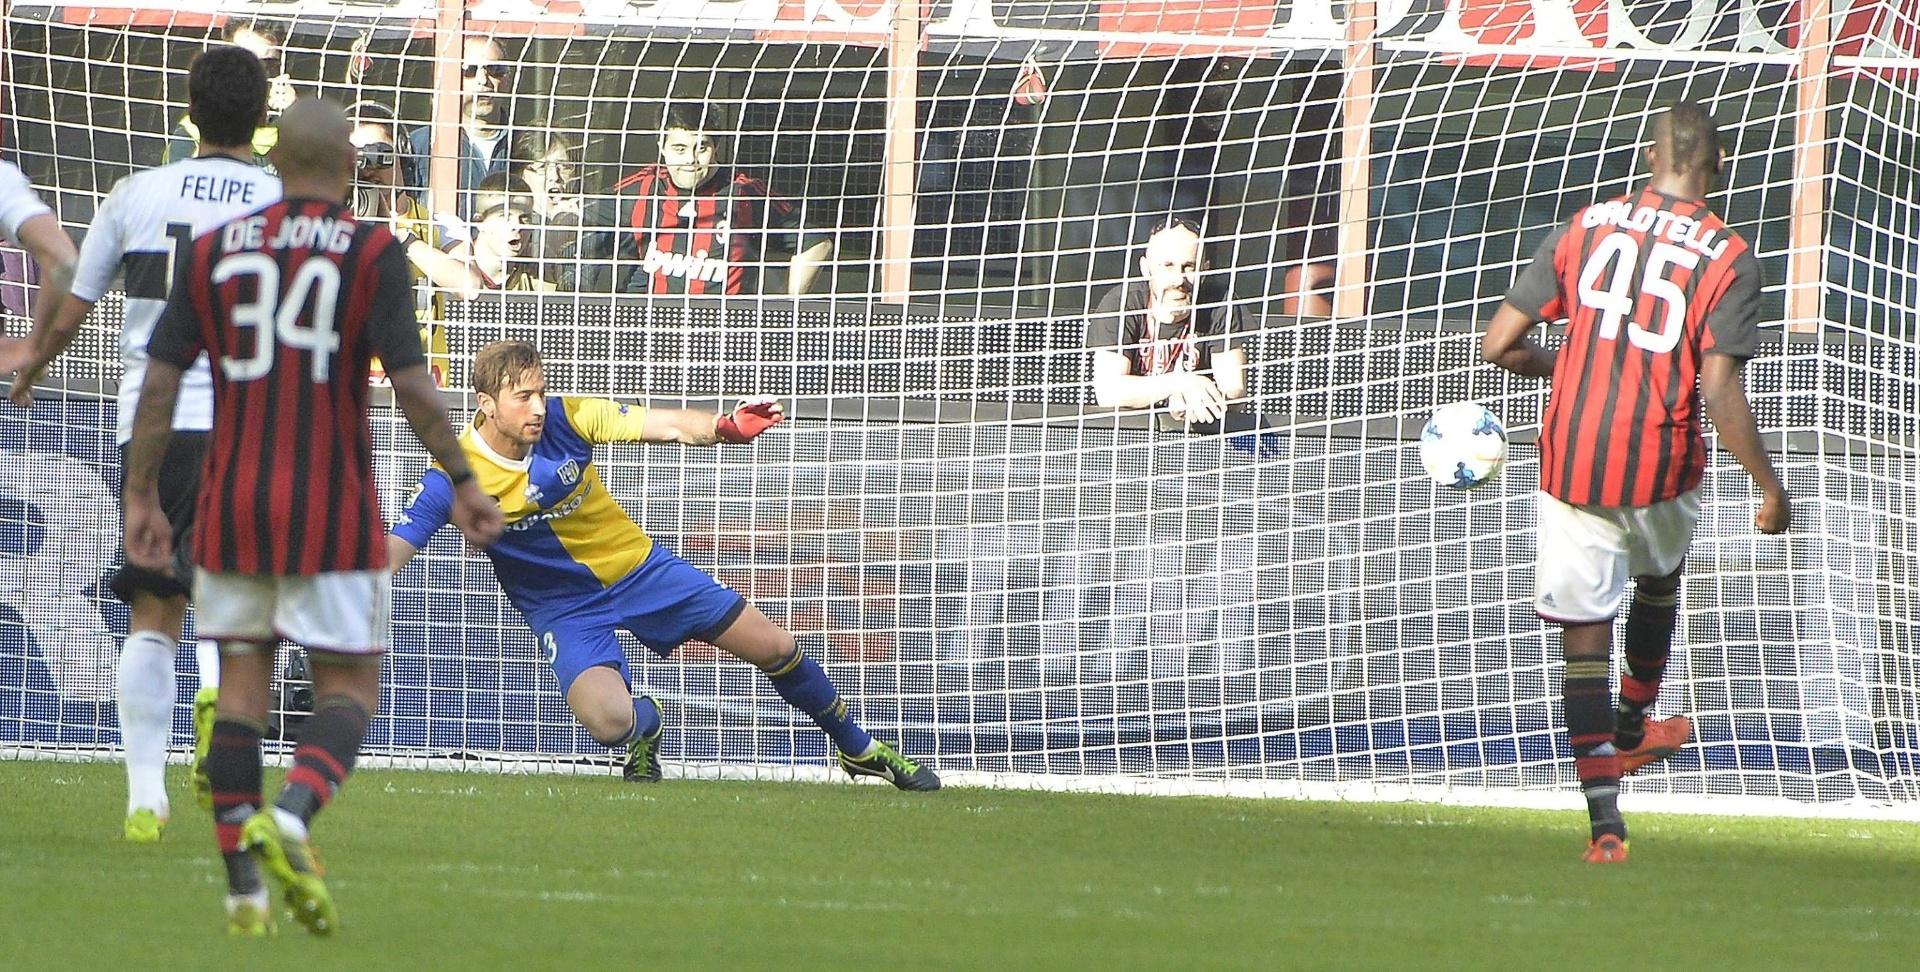 16.mar.2014 - Balotelli marca pelo Milan em cobrança de pênalti